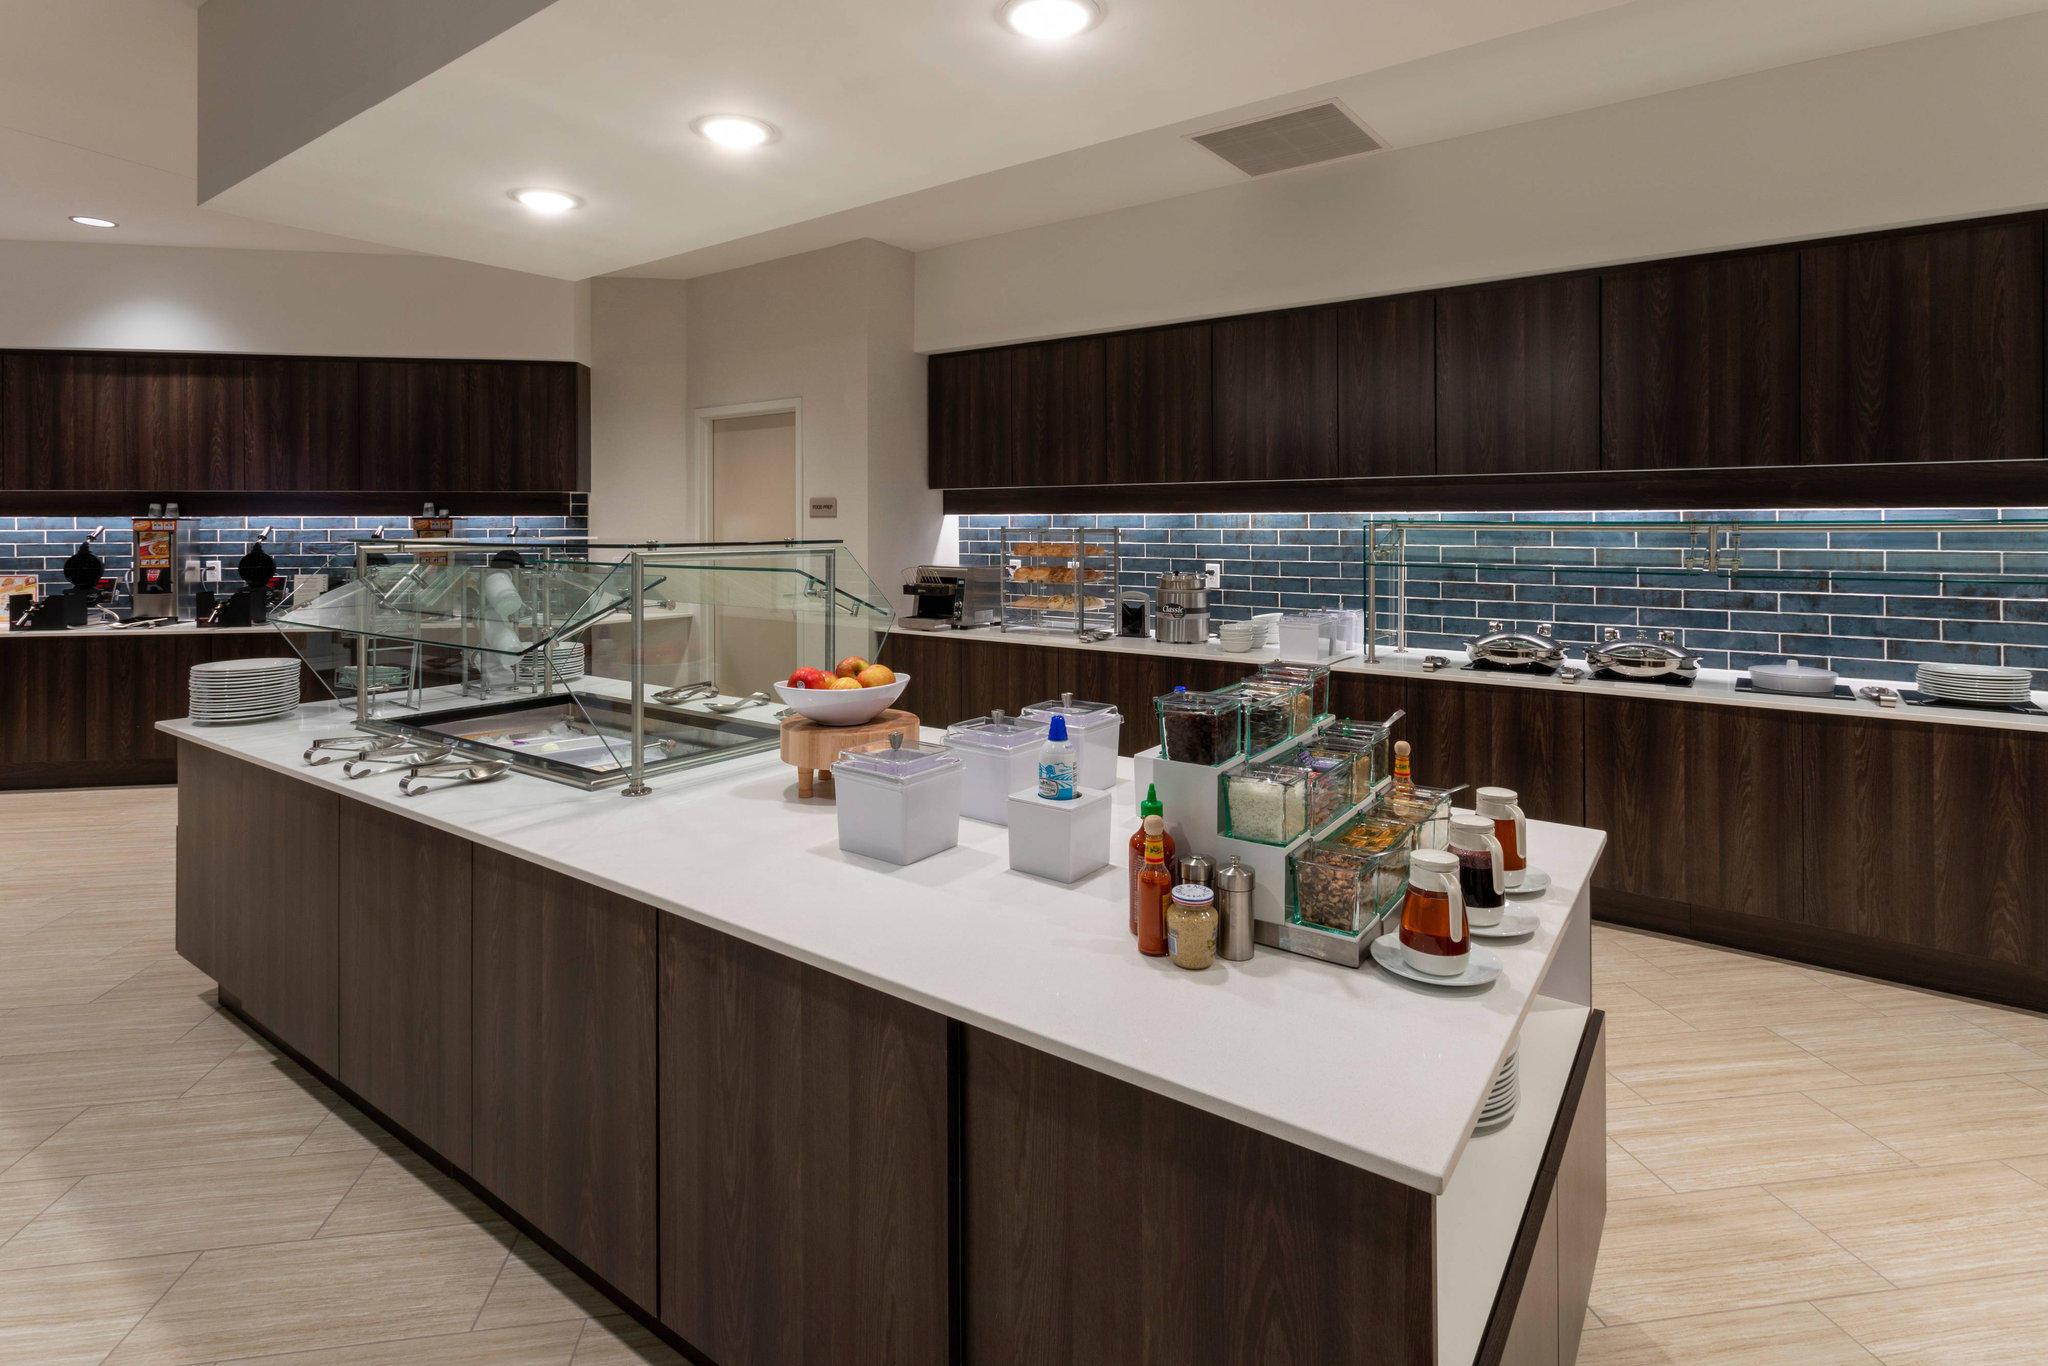 Residence Inn by Marriott Minneapolis Maple Grove/Arbor Lakes